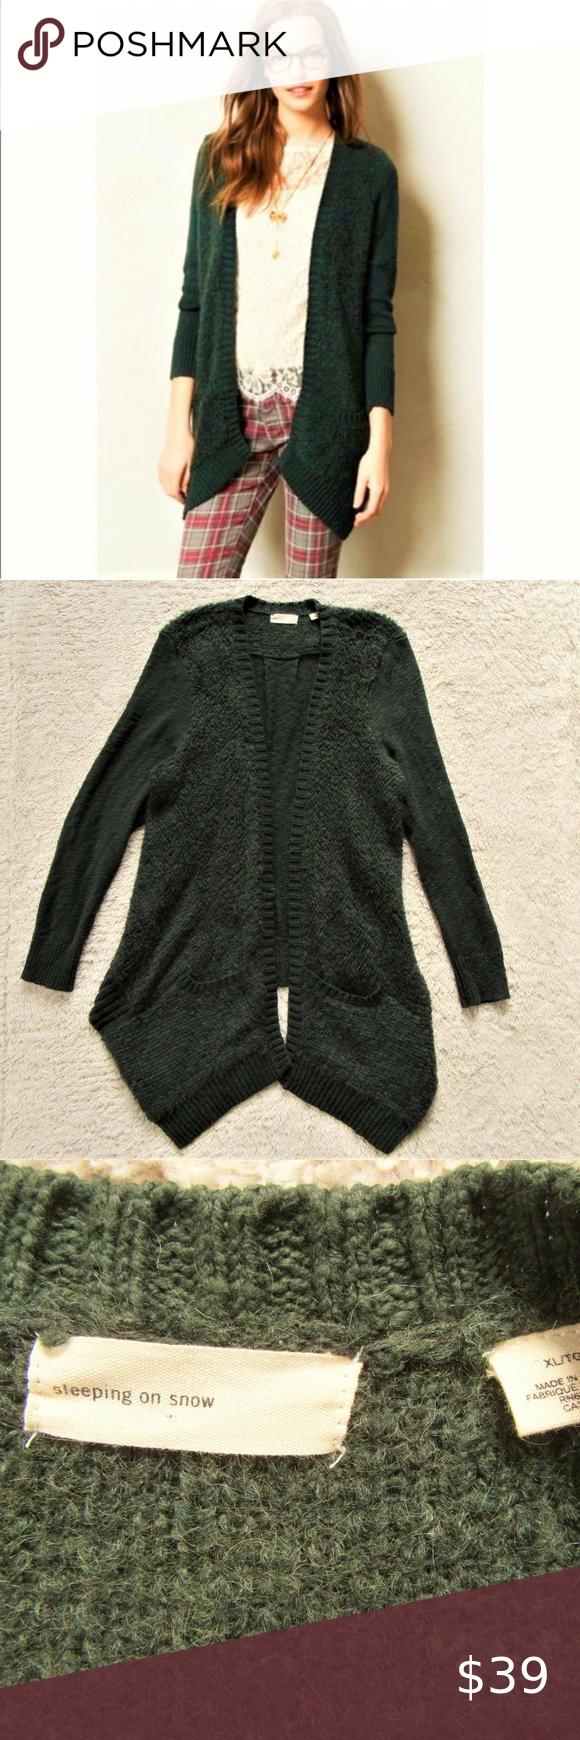 XL Anthropologie Sleeping On Snow Cardigan Sweater